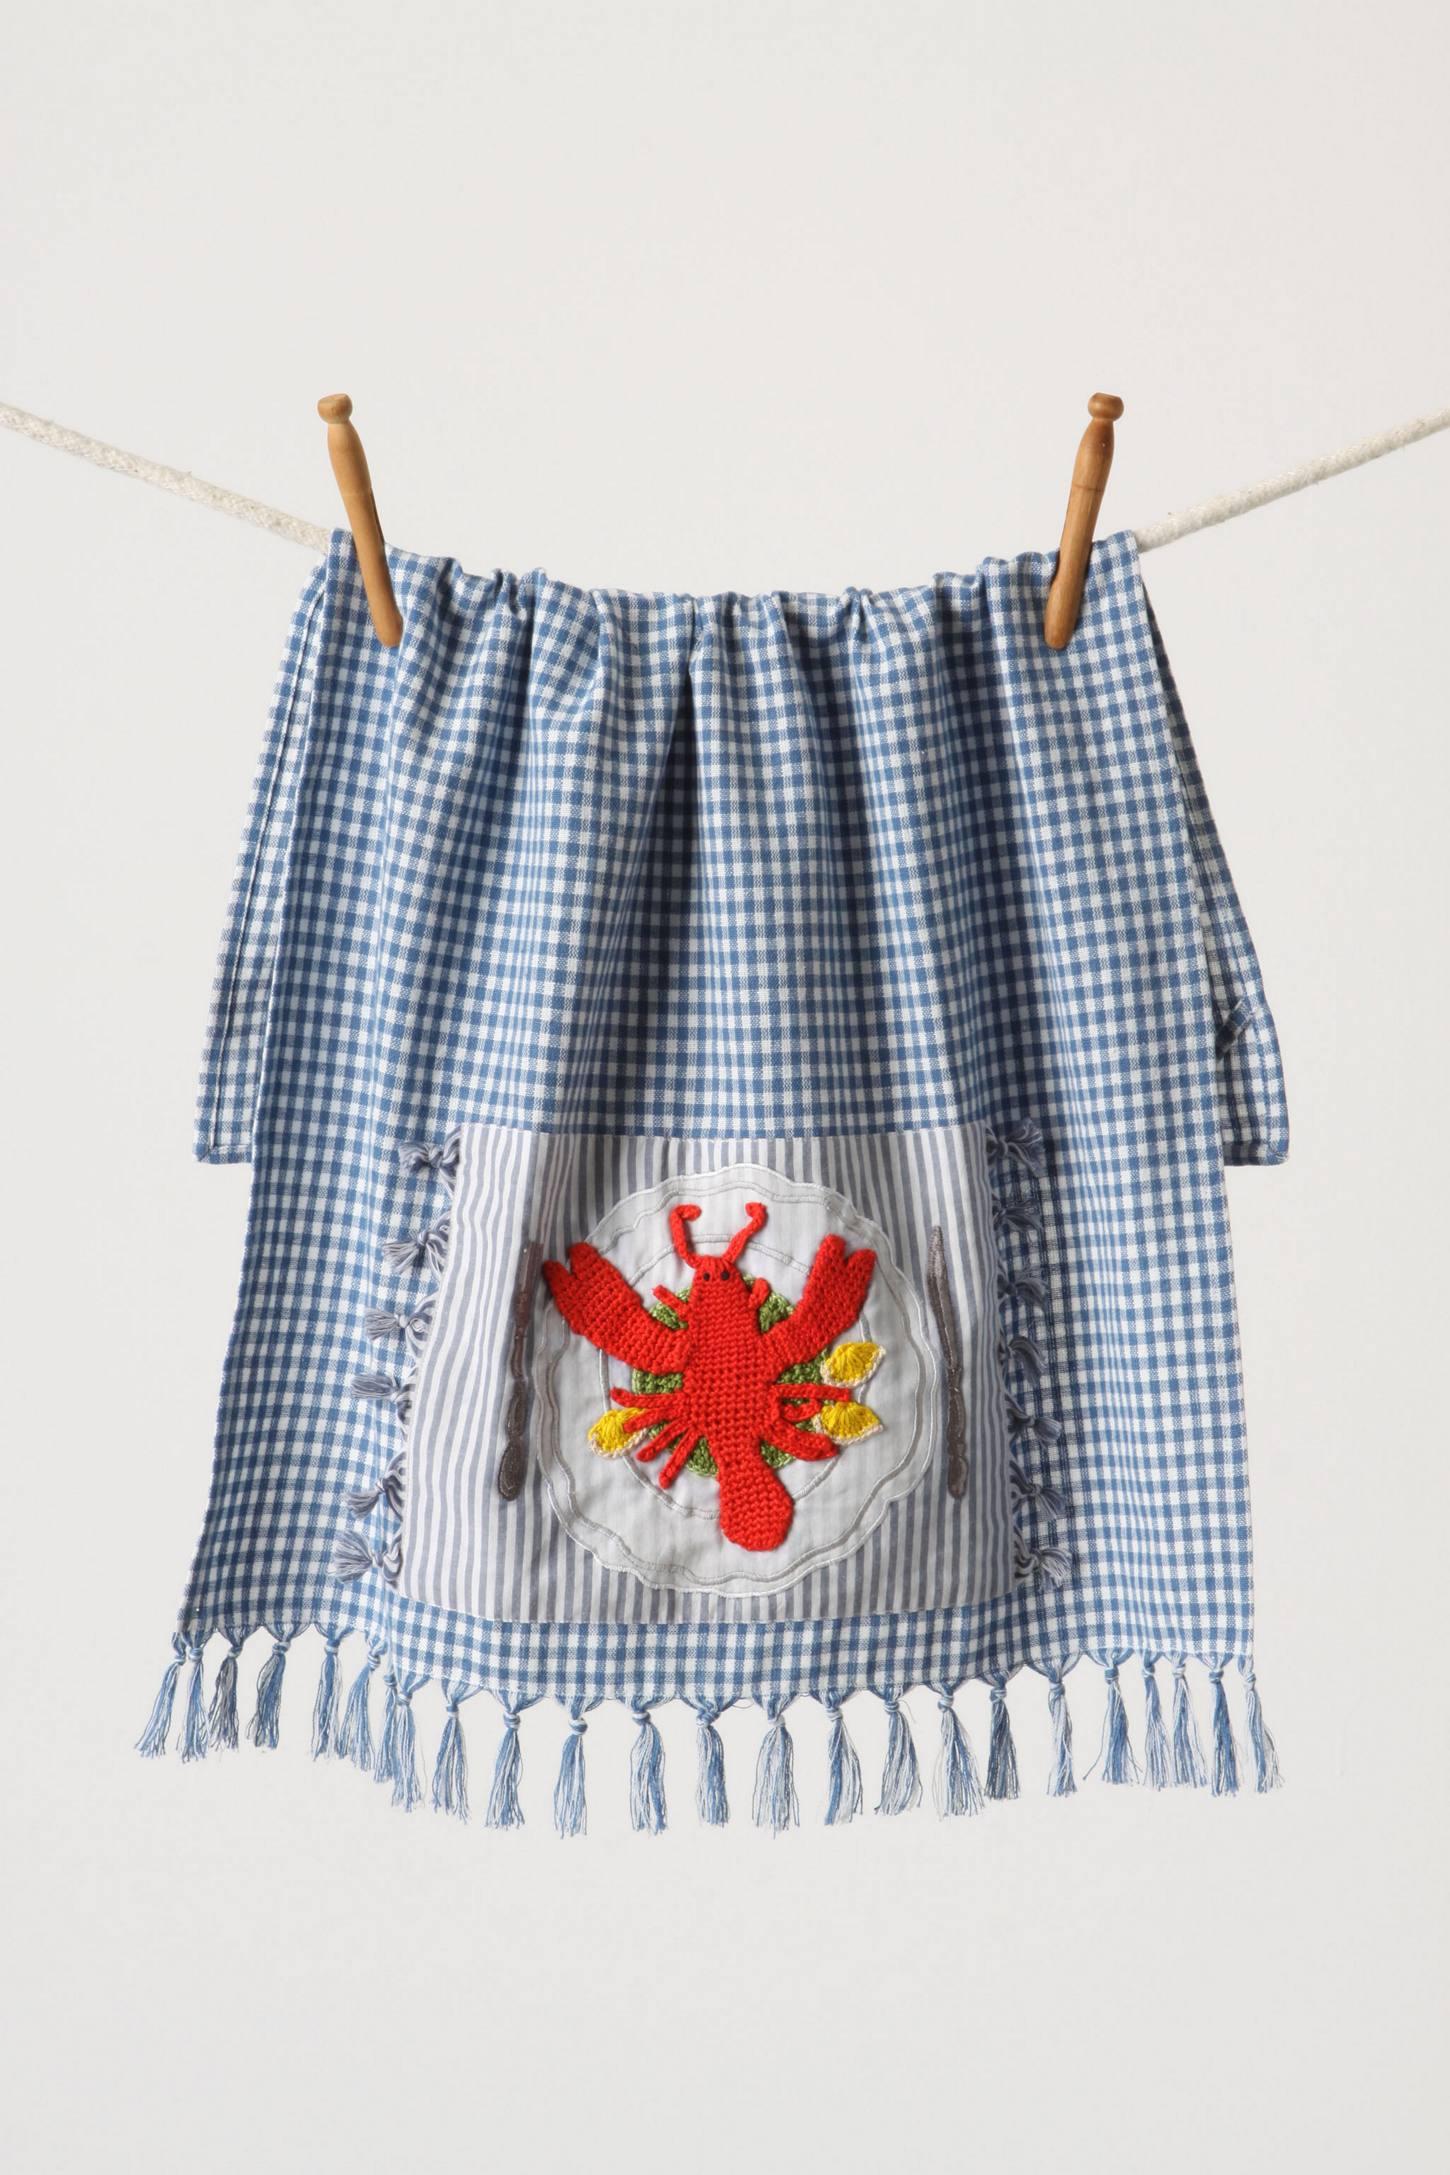 Palmer's Cove Tea Towel, Lobster